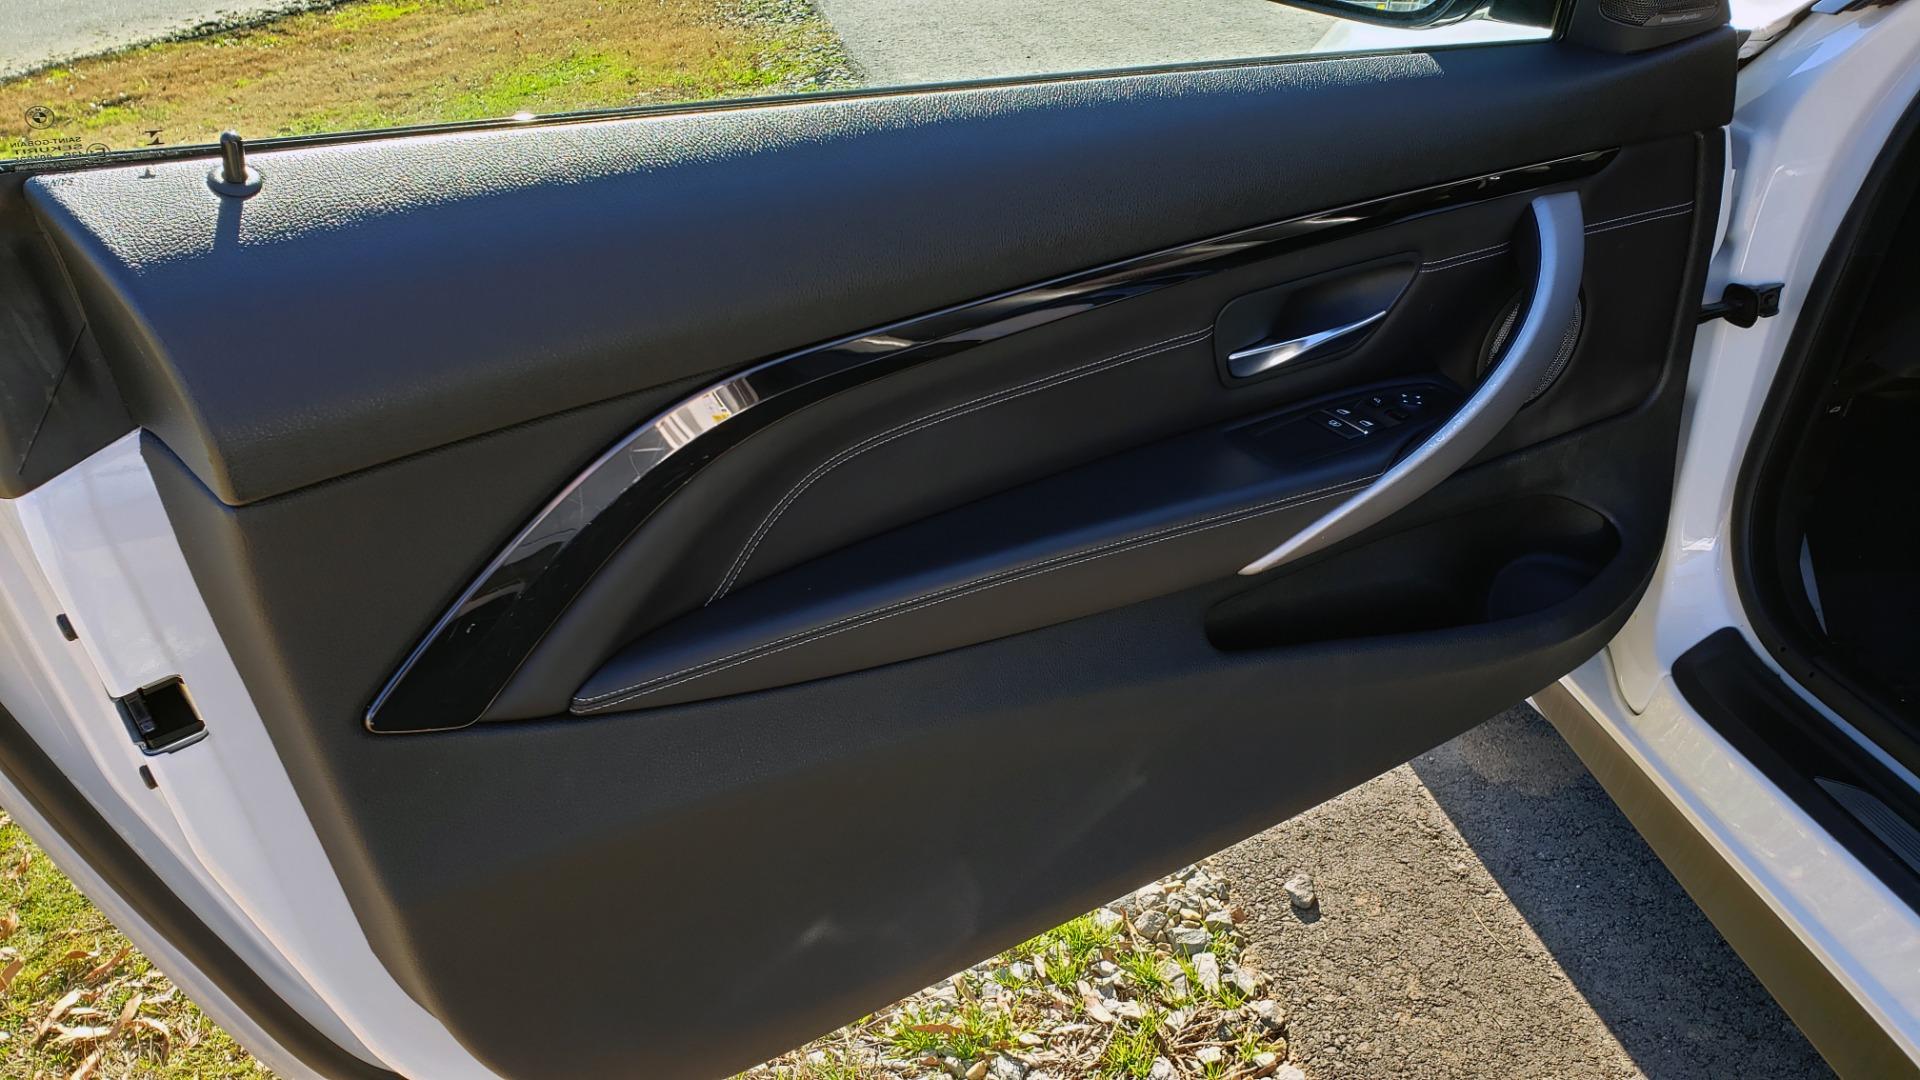 Used 2018 BMW M4 COMP PKG / EXEC / M-DRIVER / PARK CNTRL / ACTIVE BLIND SPOT for sale $45,449 at Formula Imports in Charlotte NC 28227 33